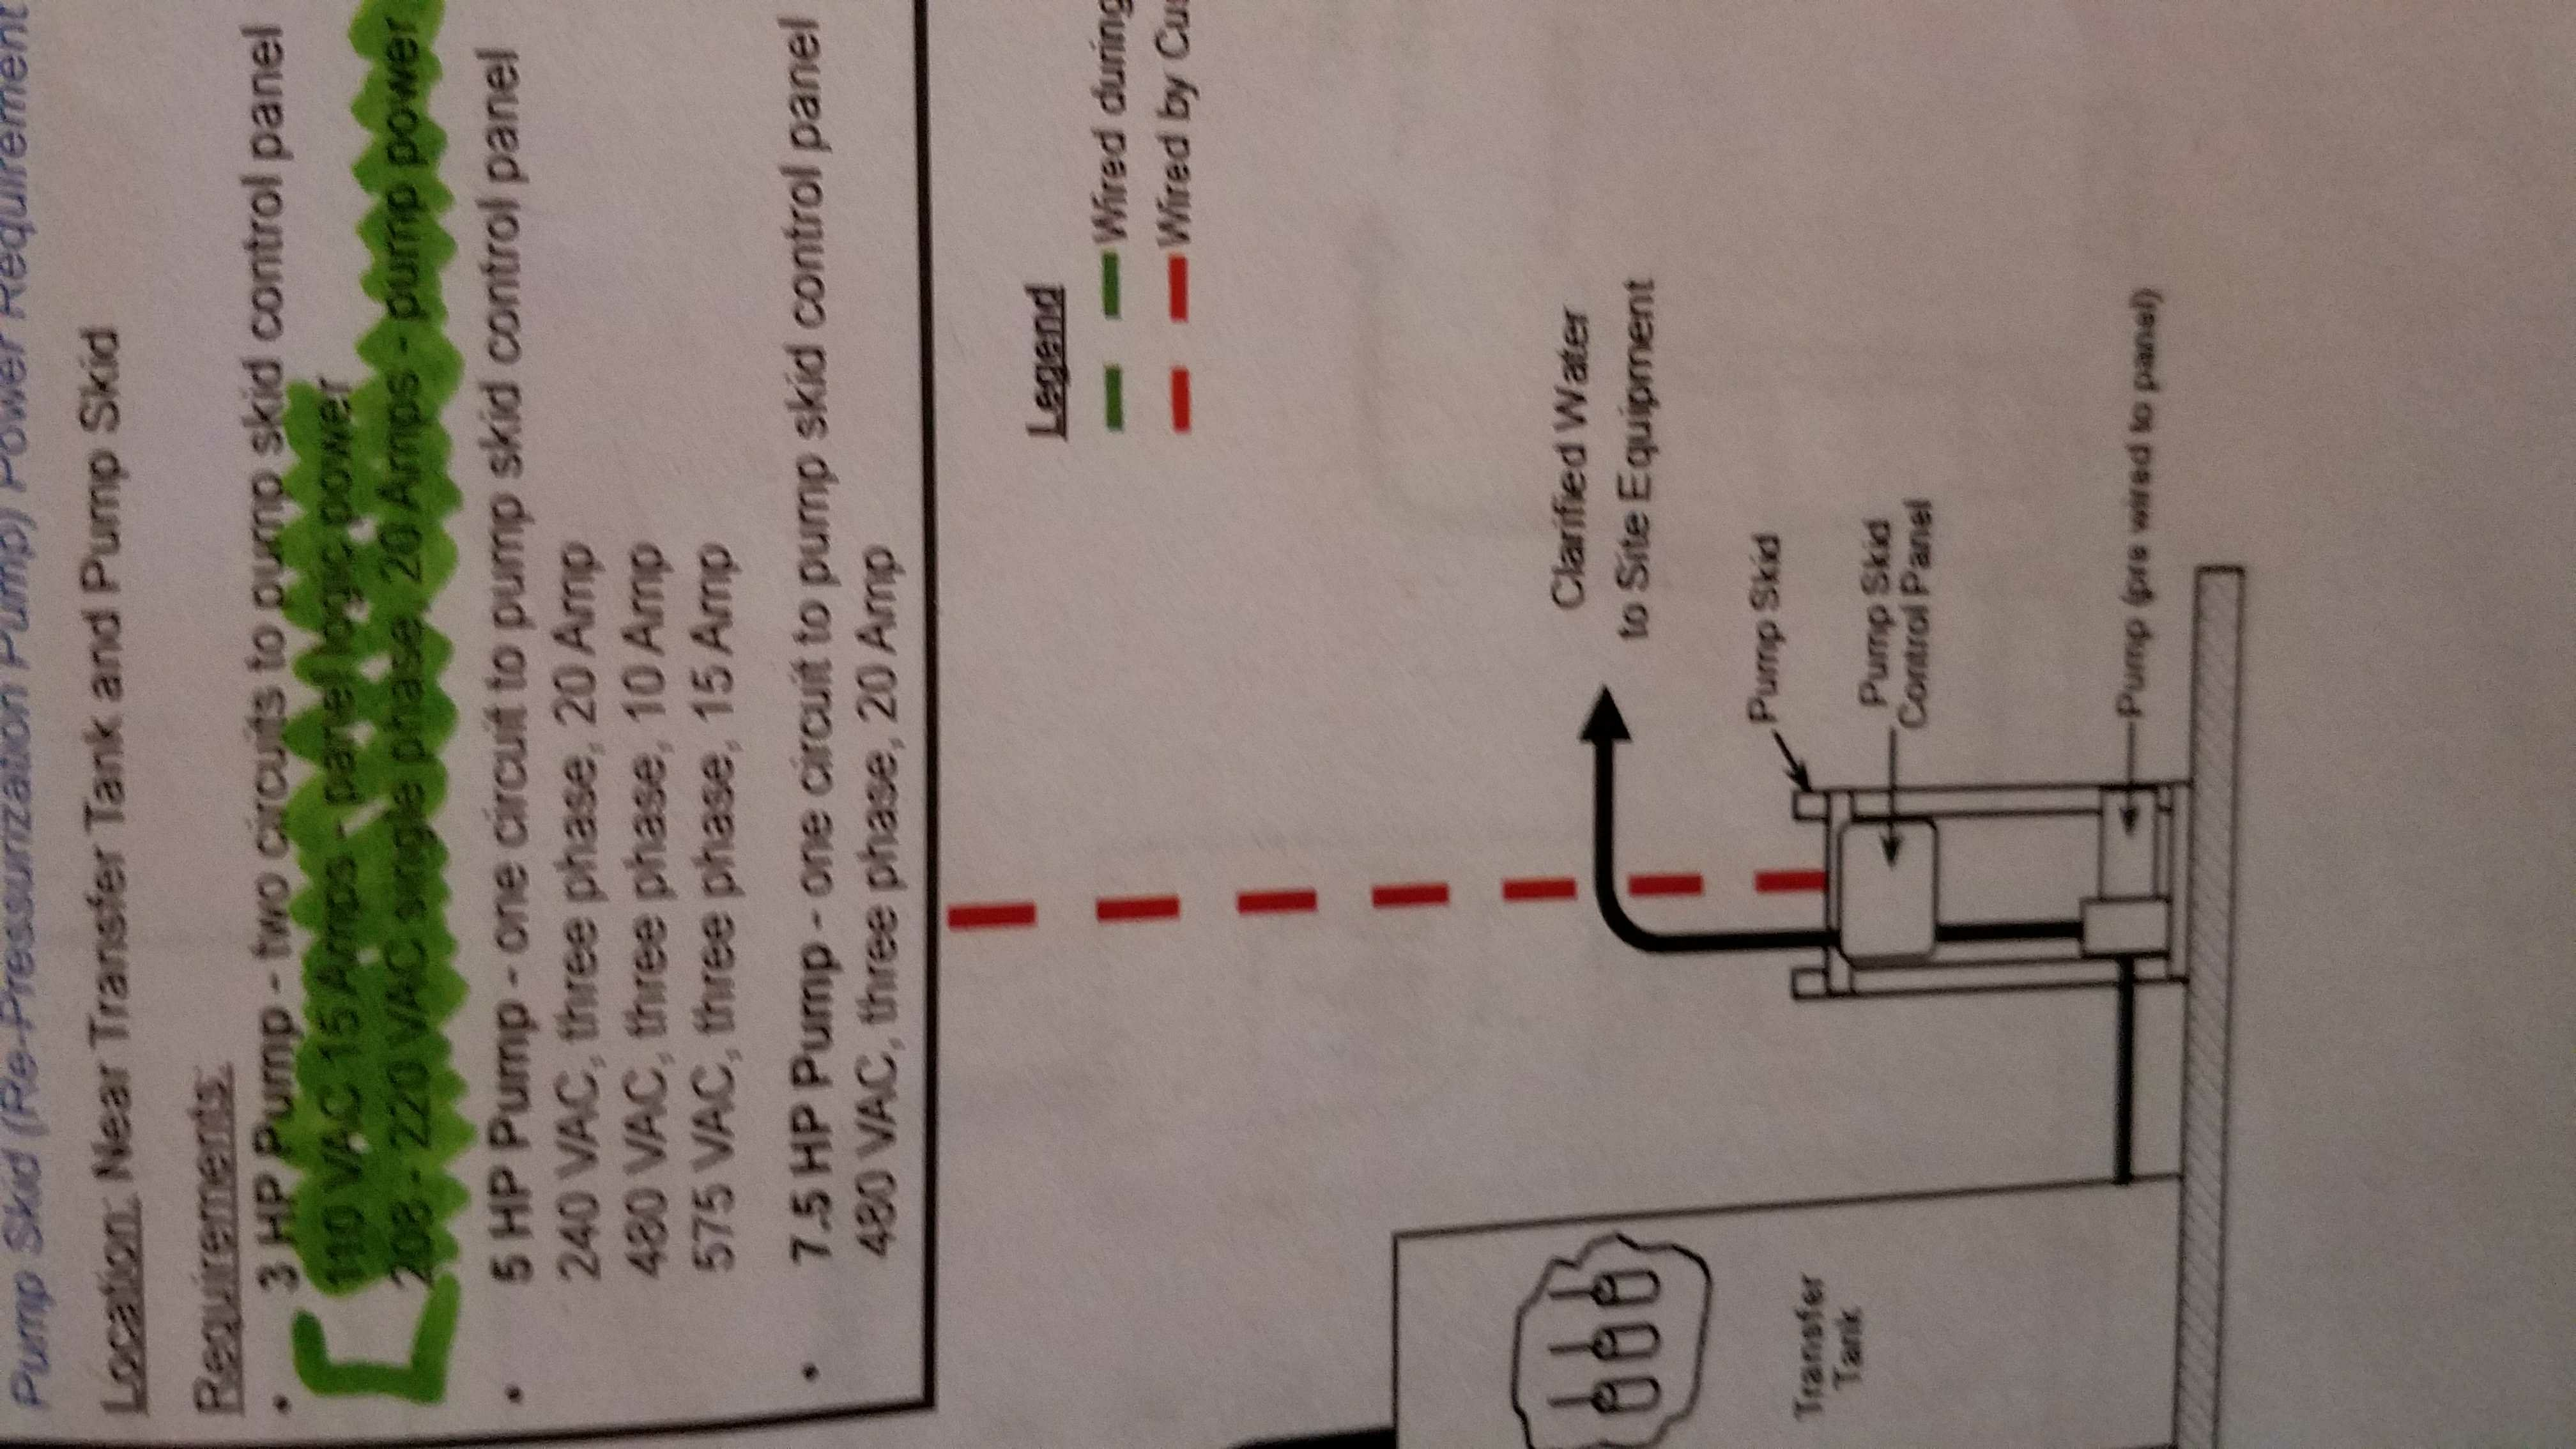 U6700 U9ad8 U304b U3064 U6700 U3082 U5305 U62ec U7684 U306a120208v Single Phase Panel